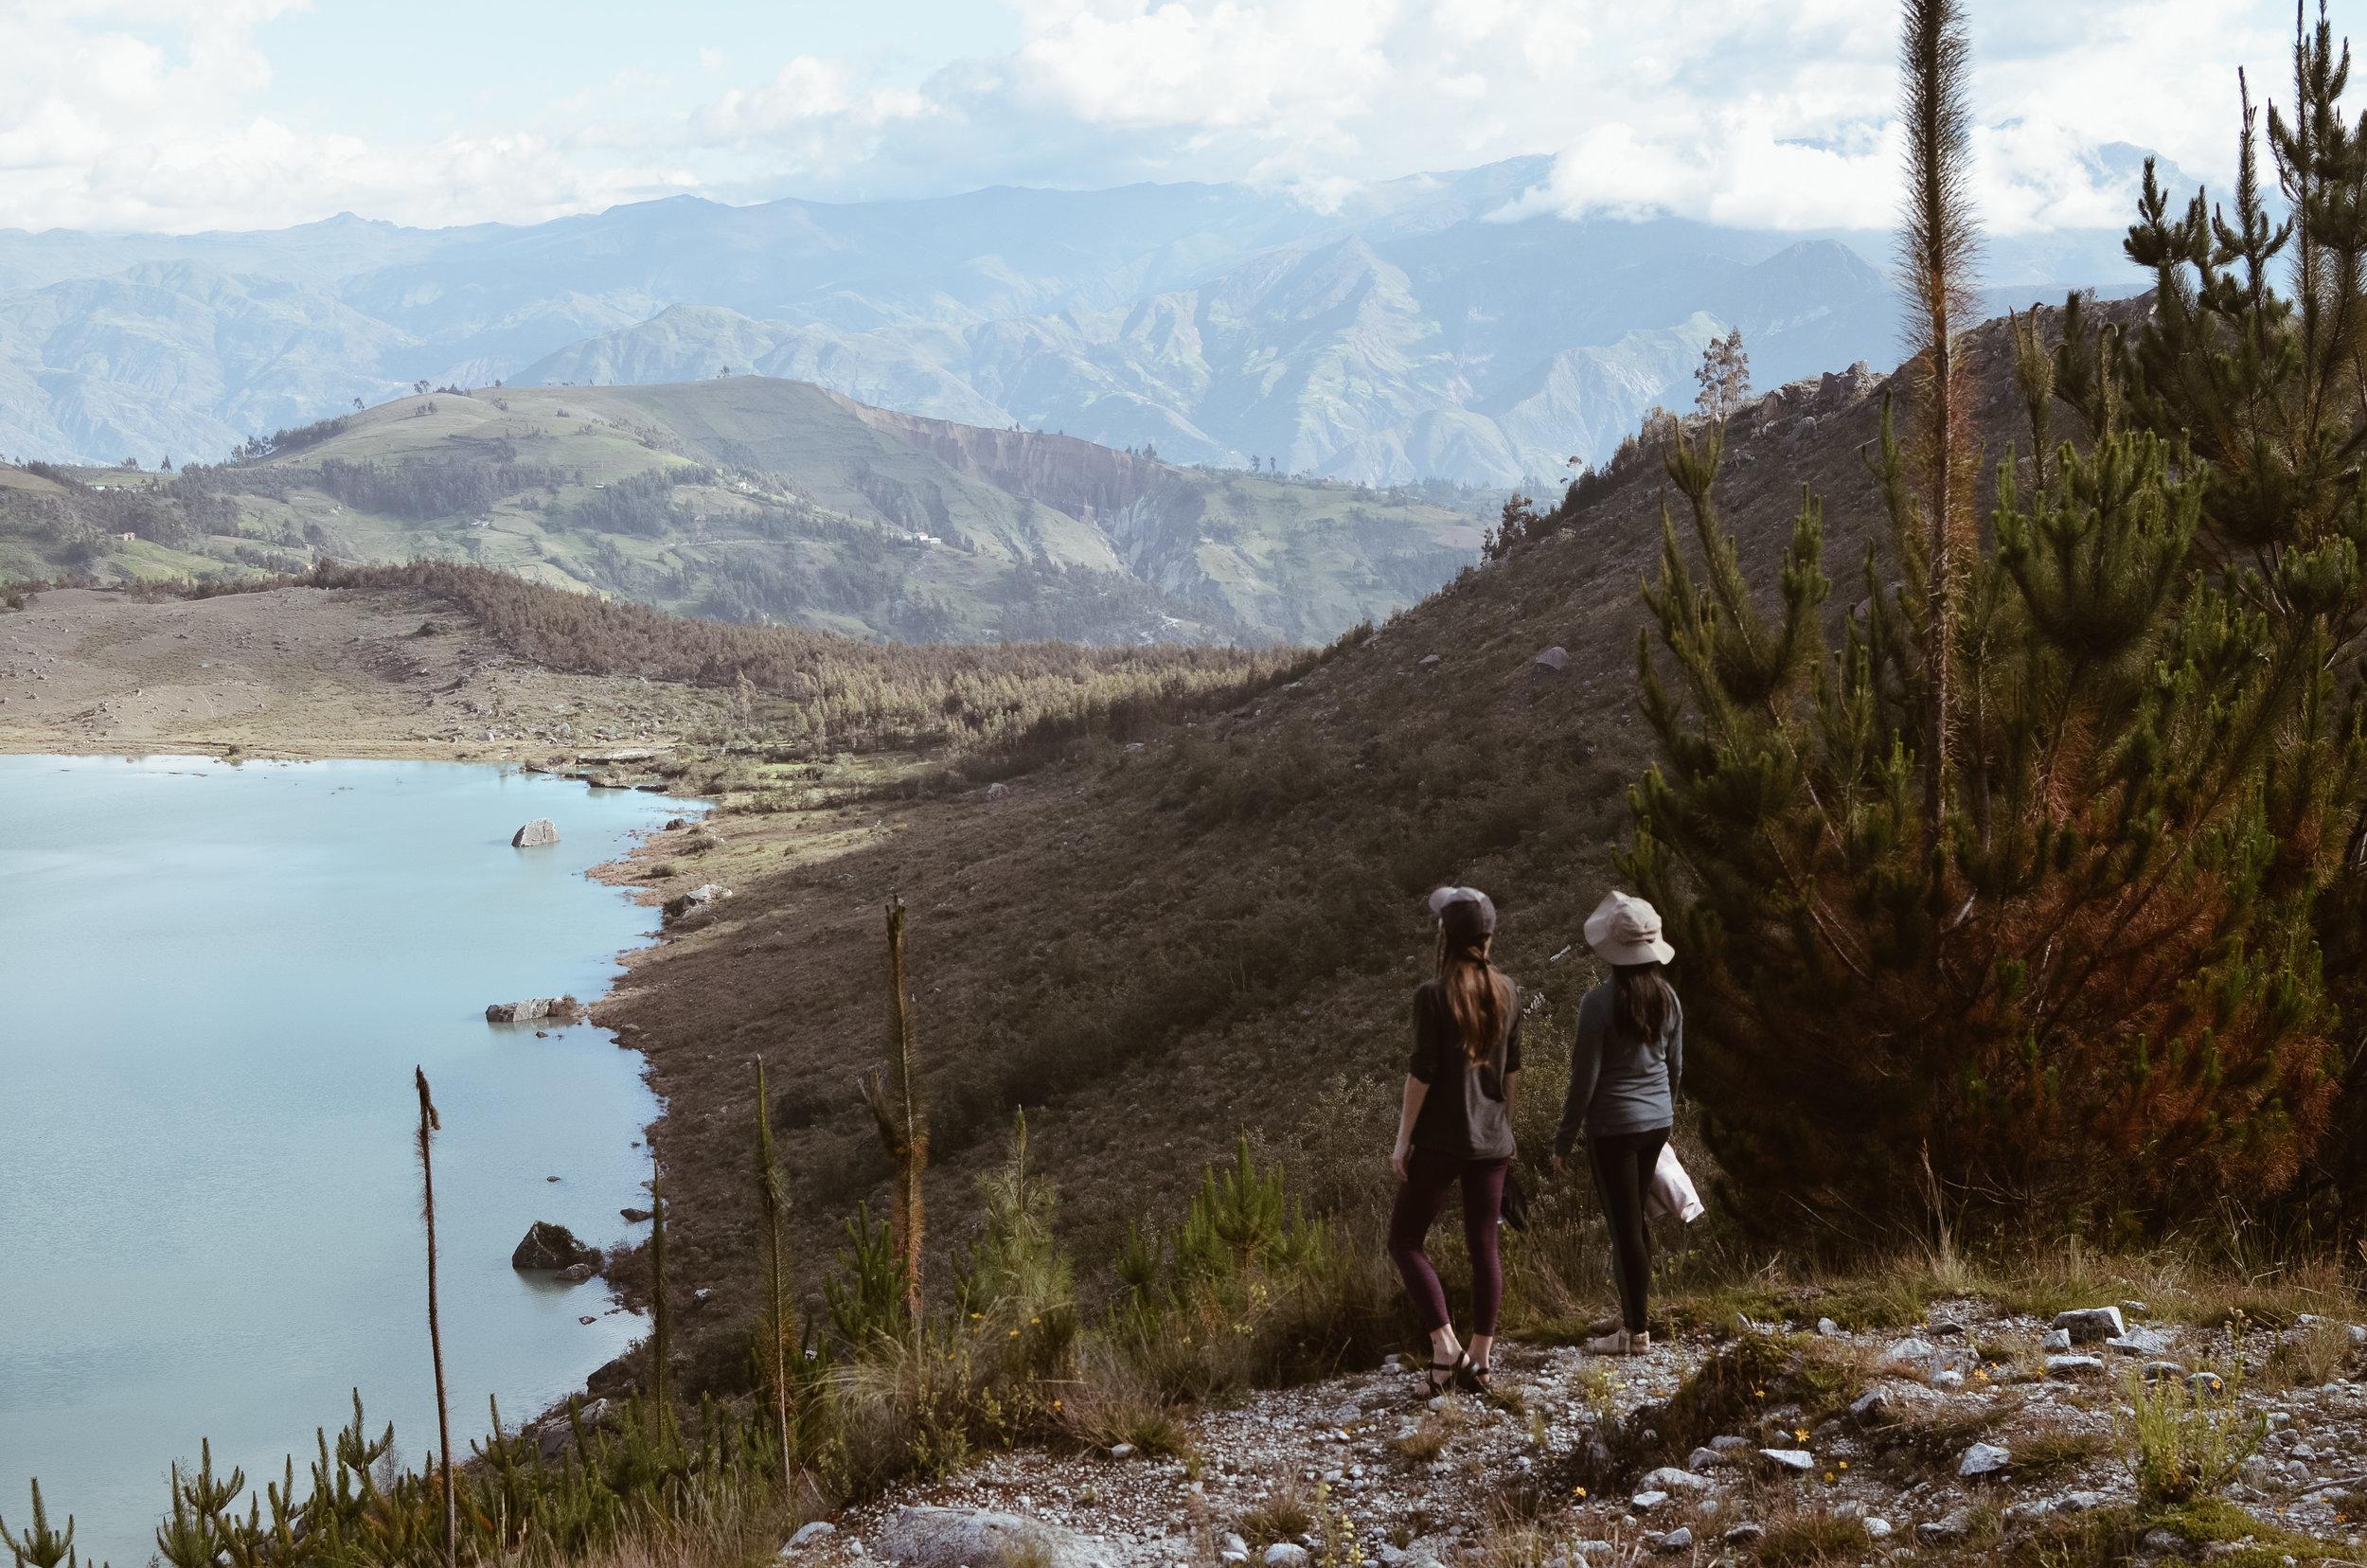 laguna+lake+69+hike+peru+travel+guide+life+on+pine_DSC_0396.jpg